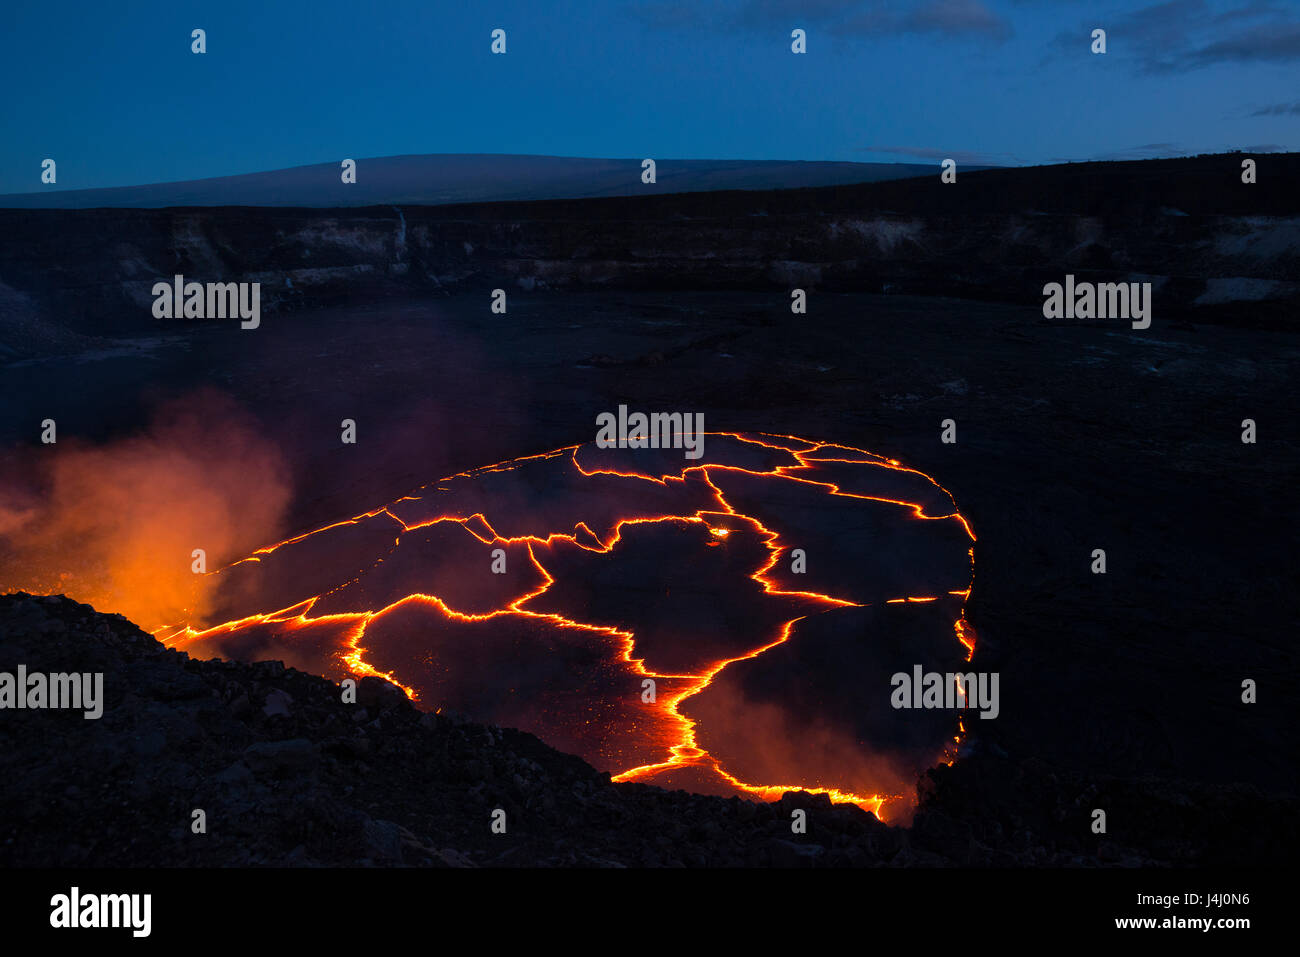 lava lake in caldera of Halemaumau Crater, Kilauea Volcano, Hawaii, USA, with Mauna Loa mountain in background in - Stock Image